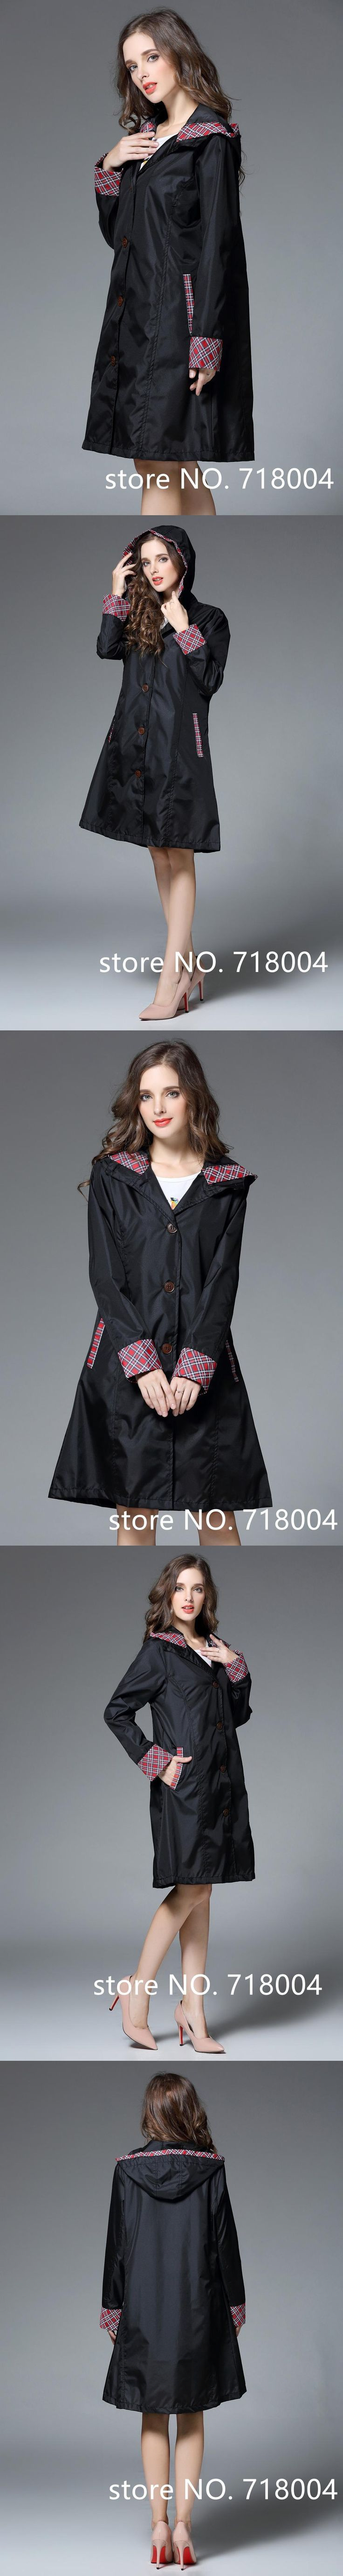 Knee Long Raincoat Women ,Waterproof Rain  Coat Ponchos Jackets Female capa de chuva Chubasqueros Impermeables Mujer